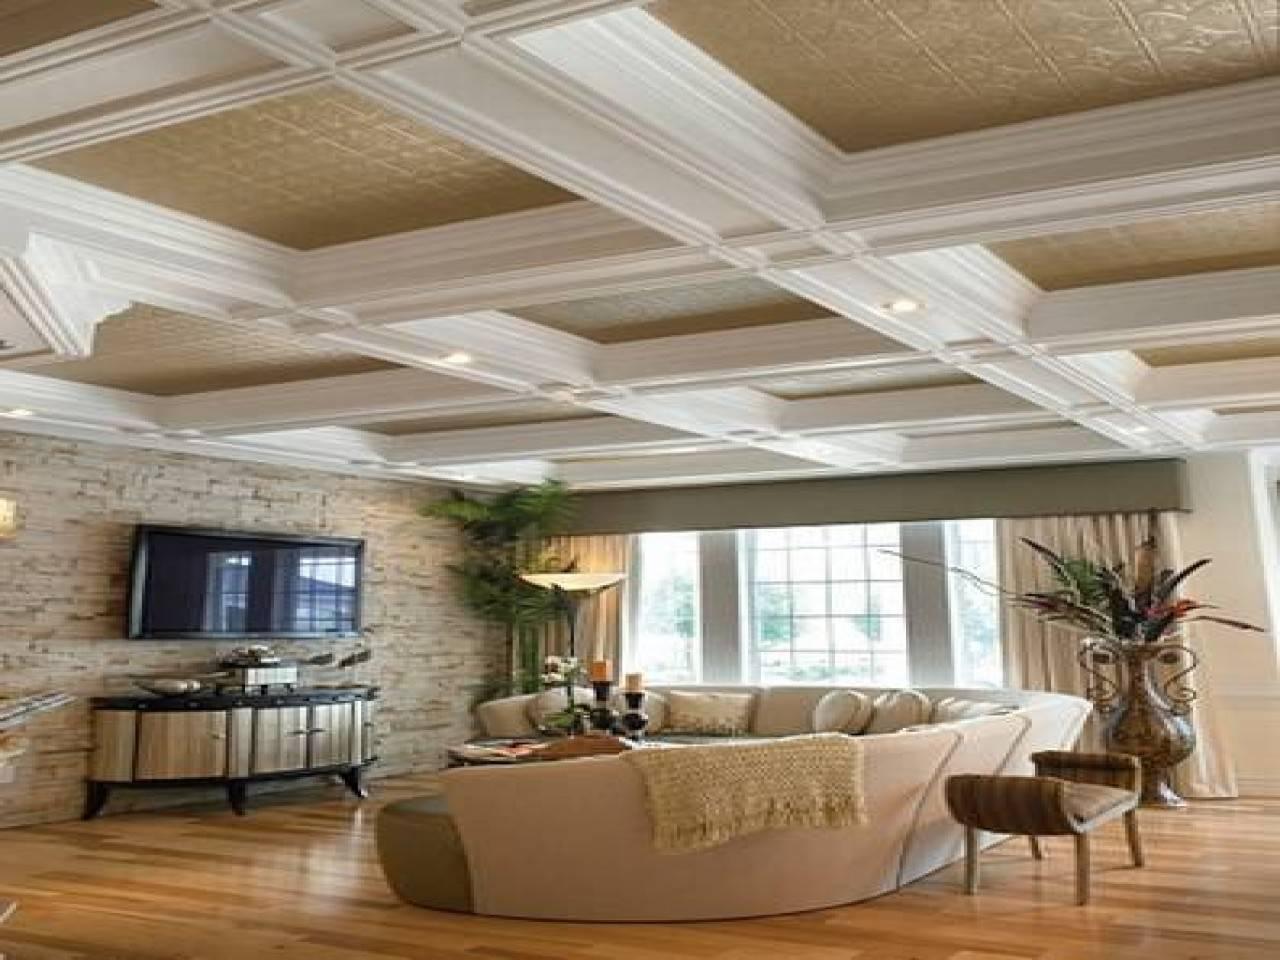 Formal Ceiling Fans Open Design Ideas Beam - Can Crusade